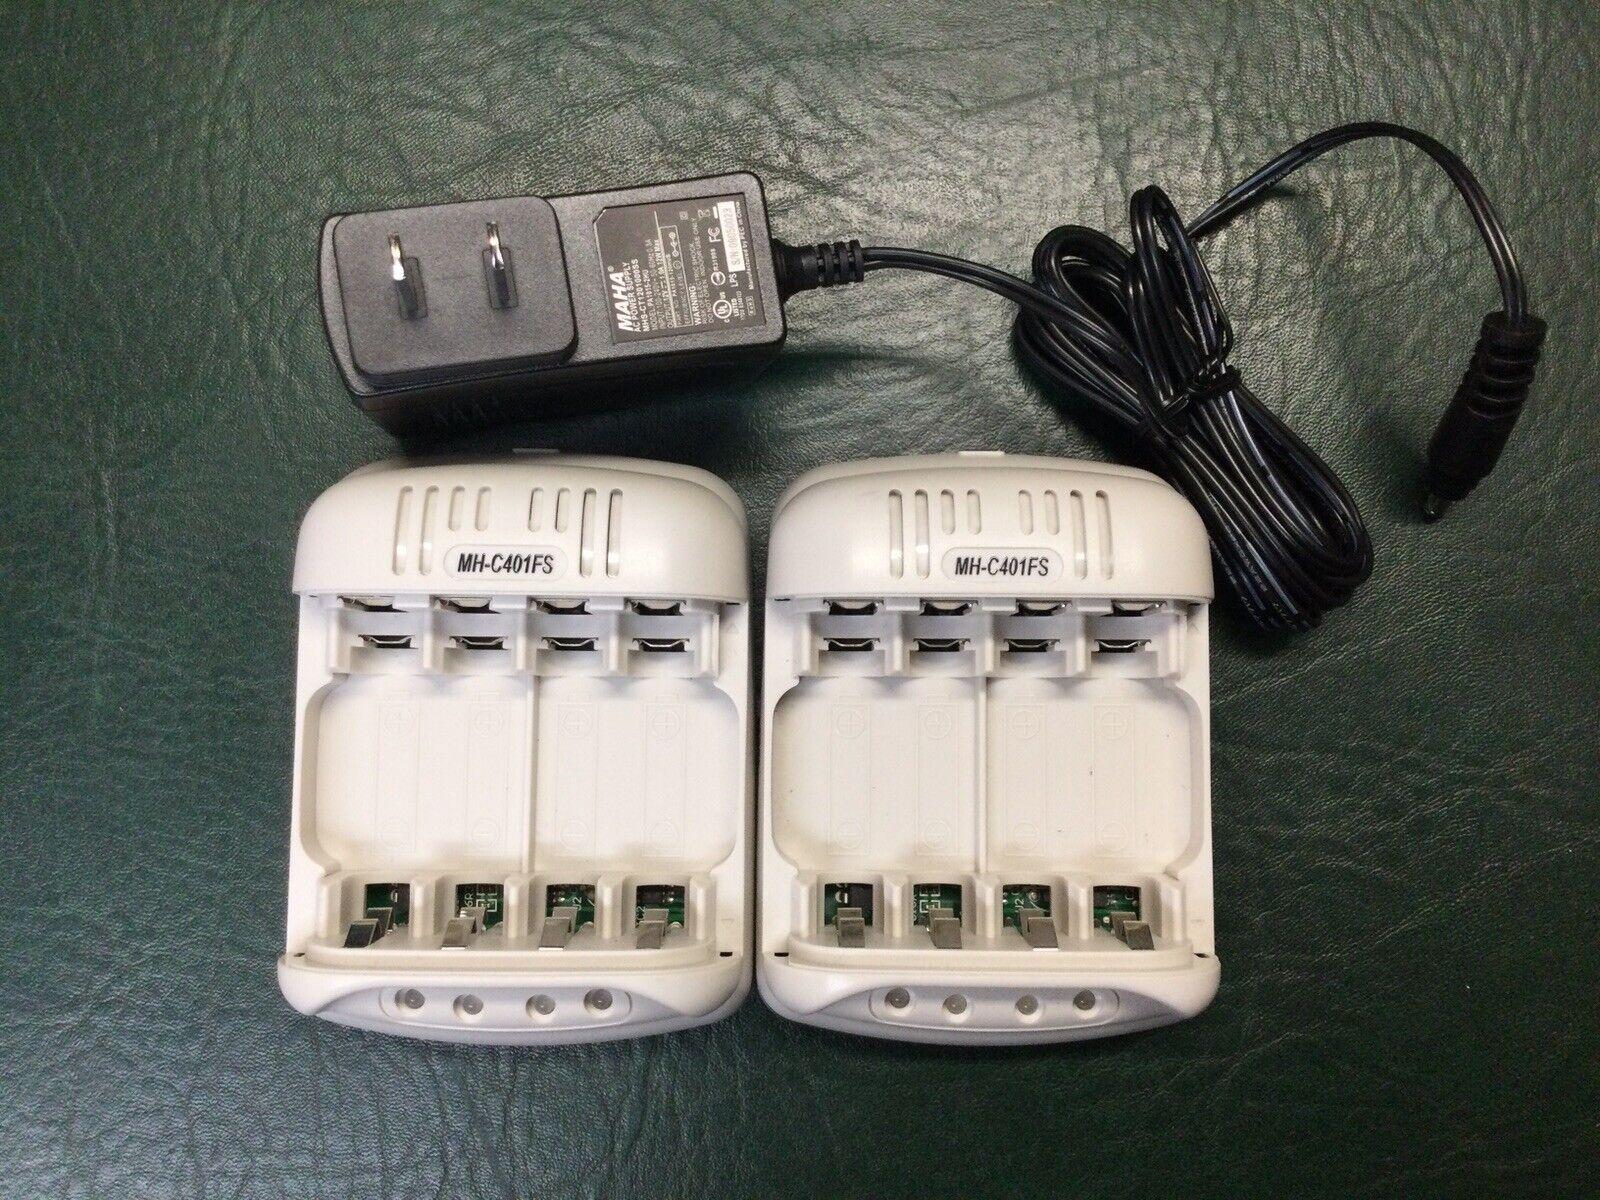 (2) MAHA MH-C401FS Class 2 Battery Chargers w/ 1 Maha AC Power Supply